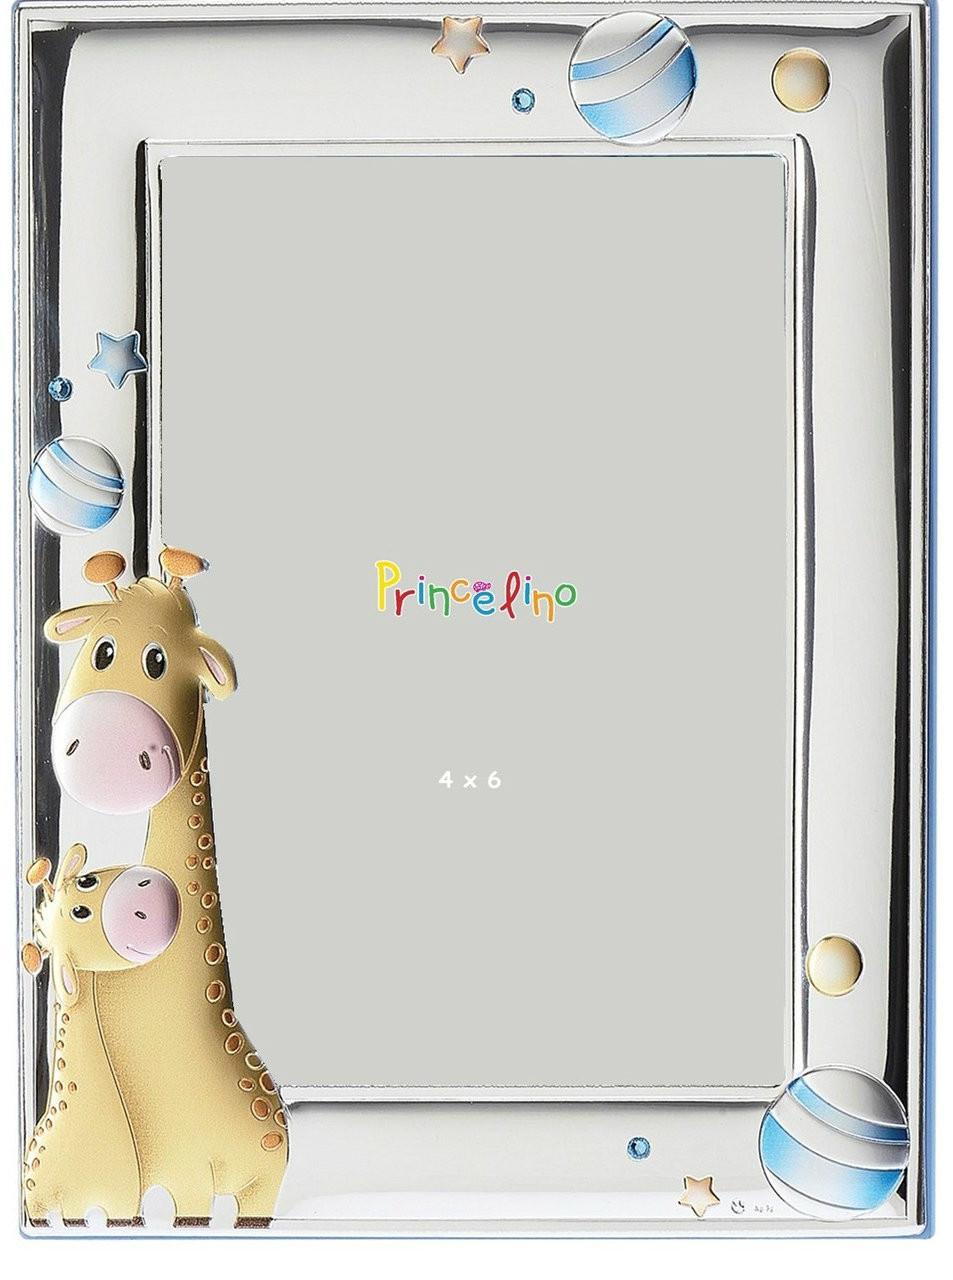 Silver Plated Giraffe Design Photo Frame